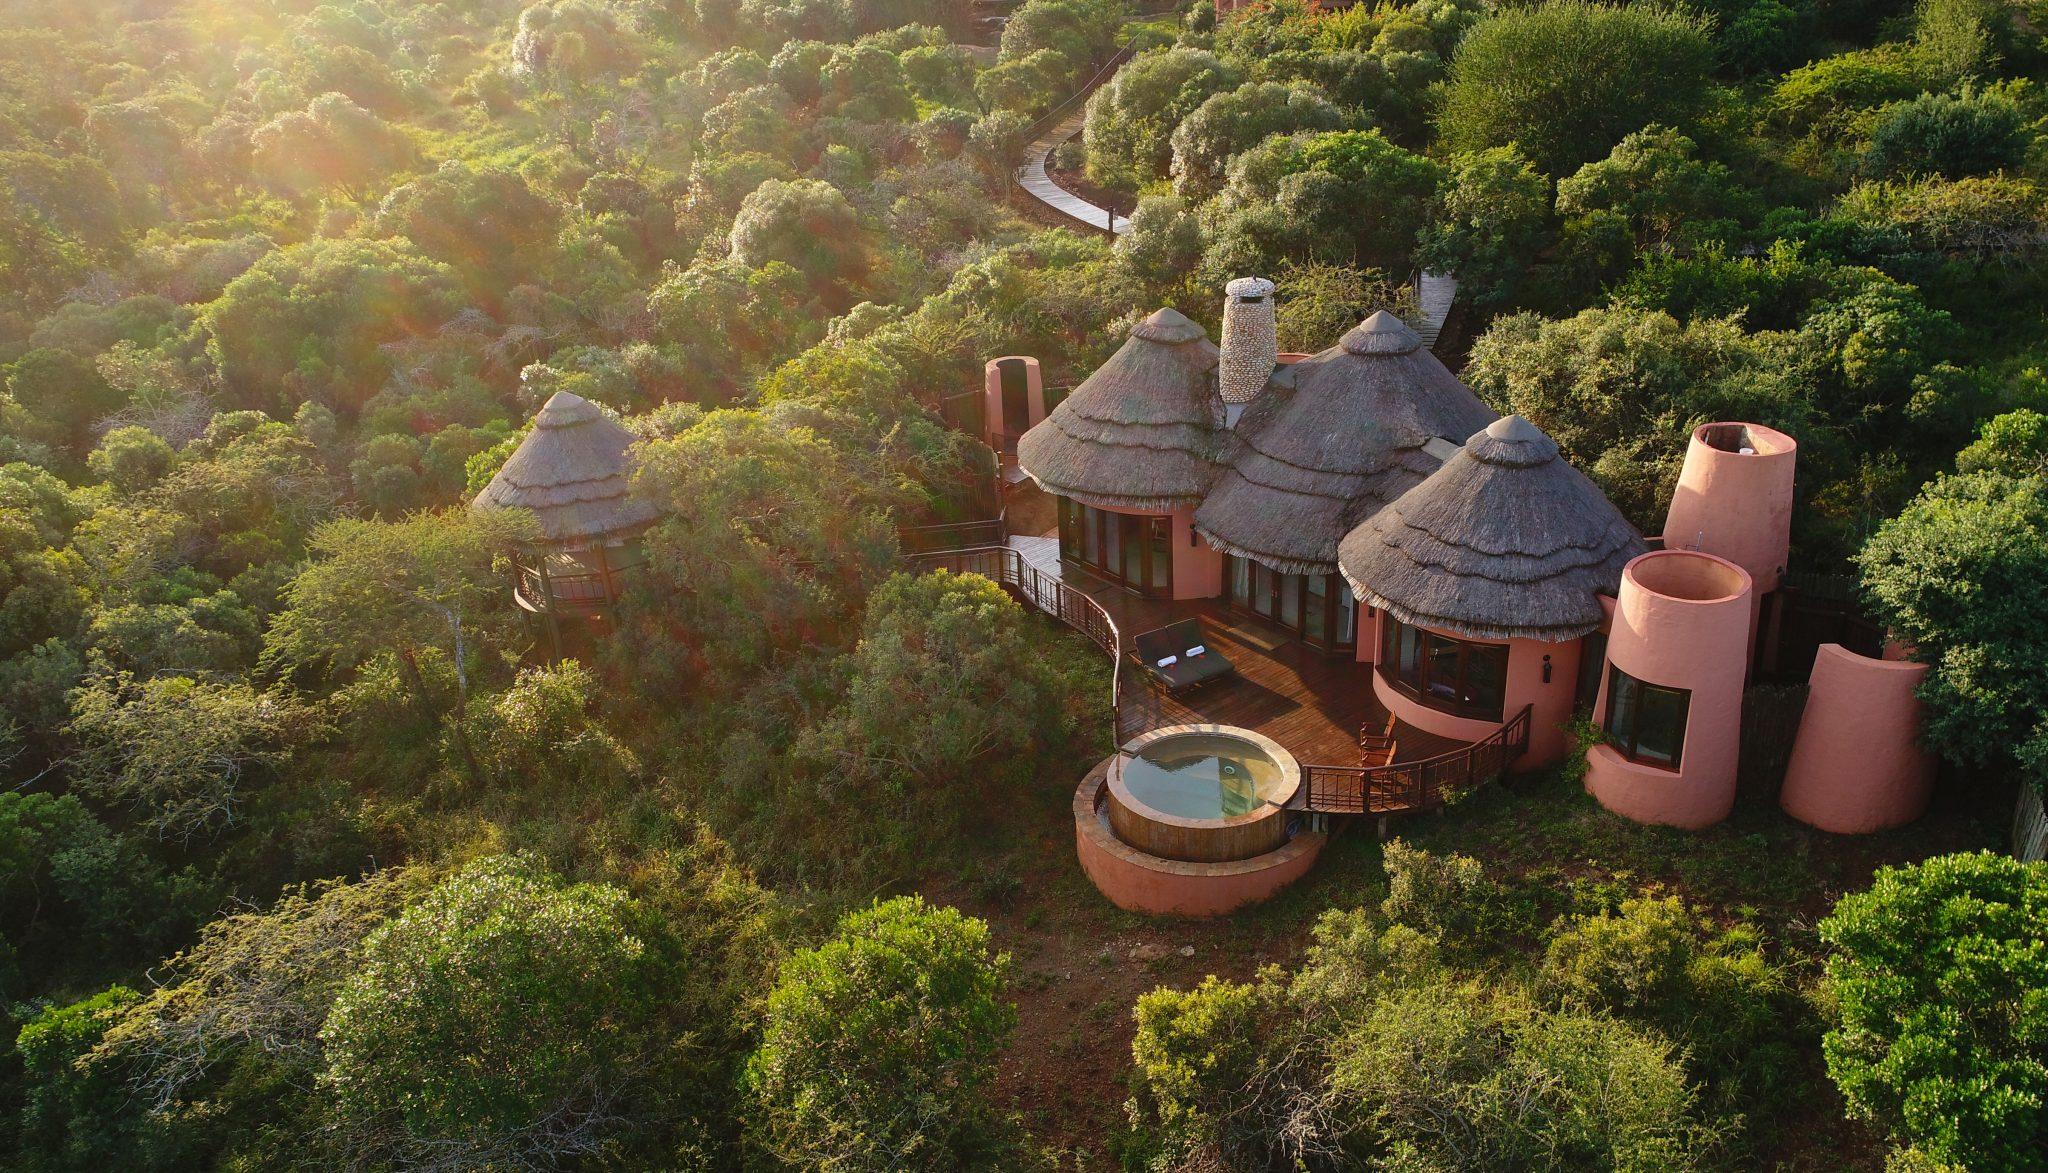 Tanda Safari Reservat von oben